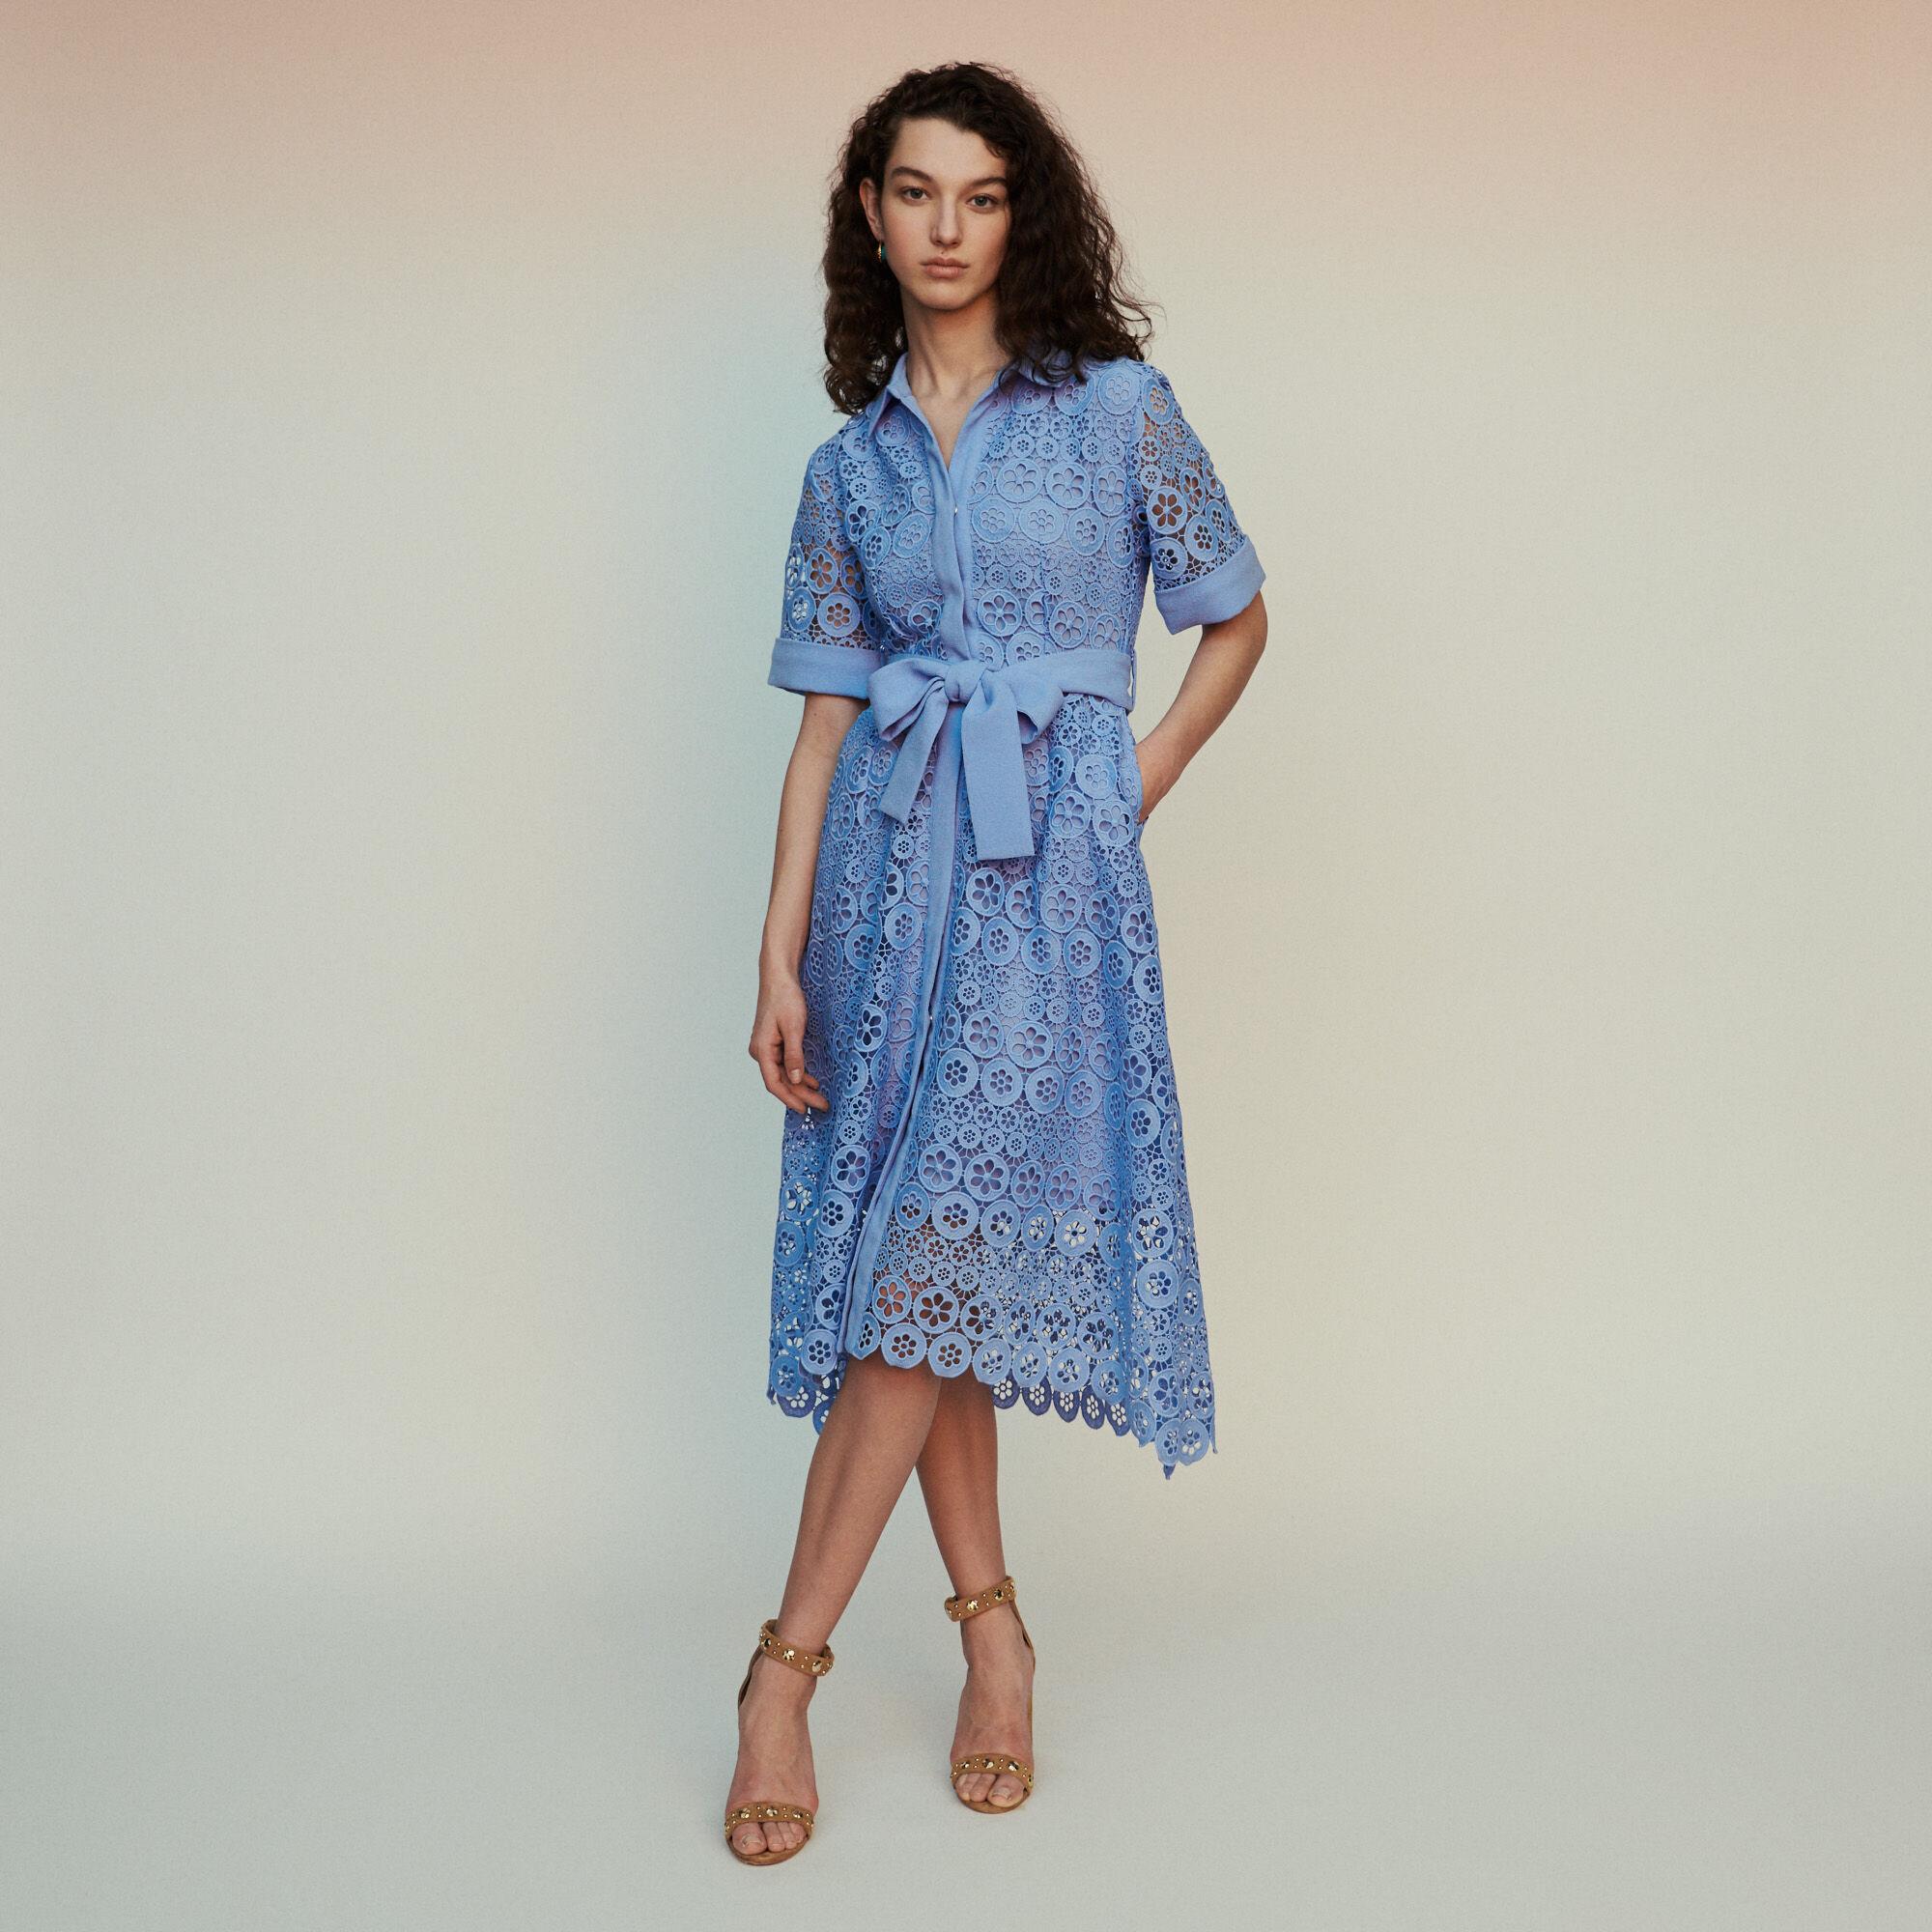 Bekleidung Kleider Kollektion Bekleidung Kleider Kleider Kollektion k8n0OXNwPZ